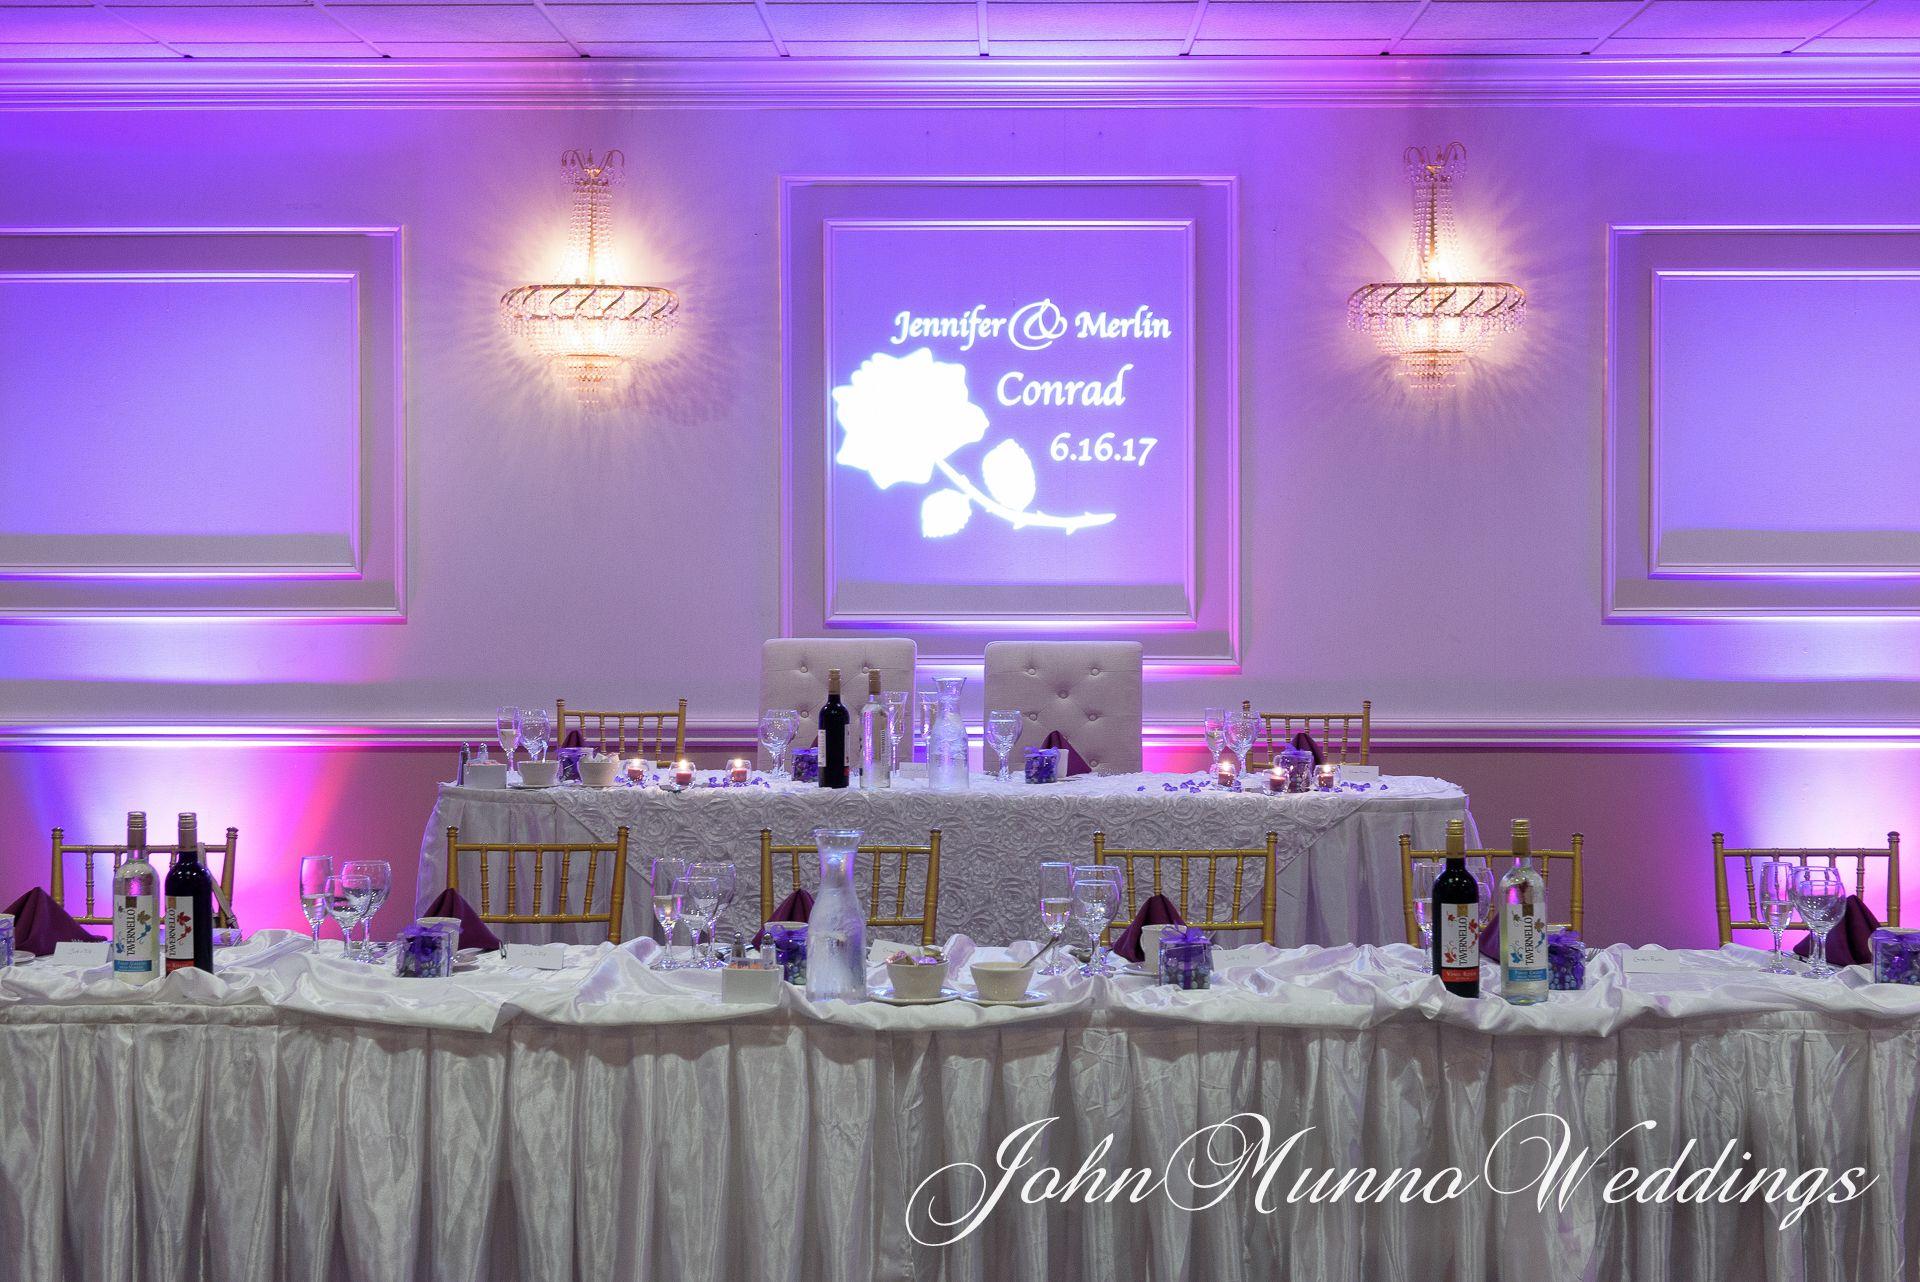 Wedding venue decoration ideas  Sweetheart table and reception decor shot at Fantasia wedding venue